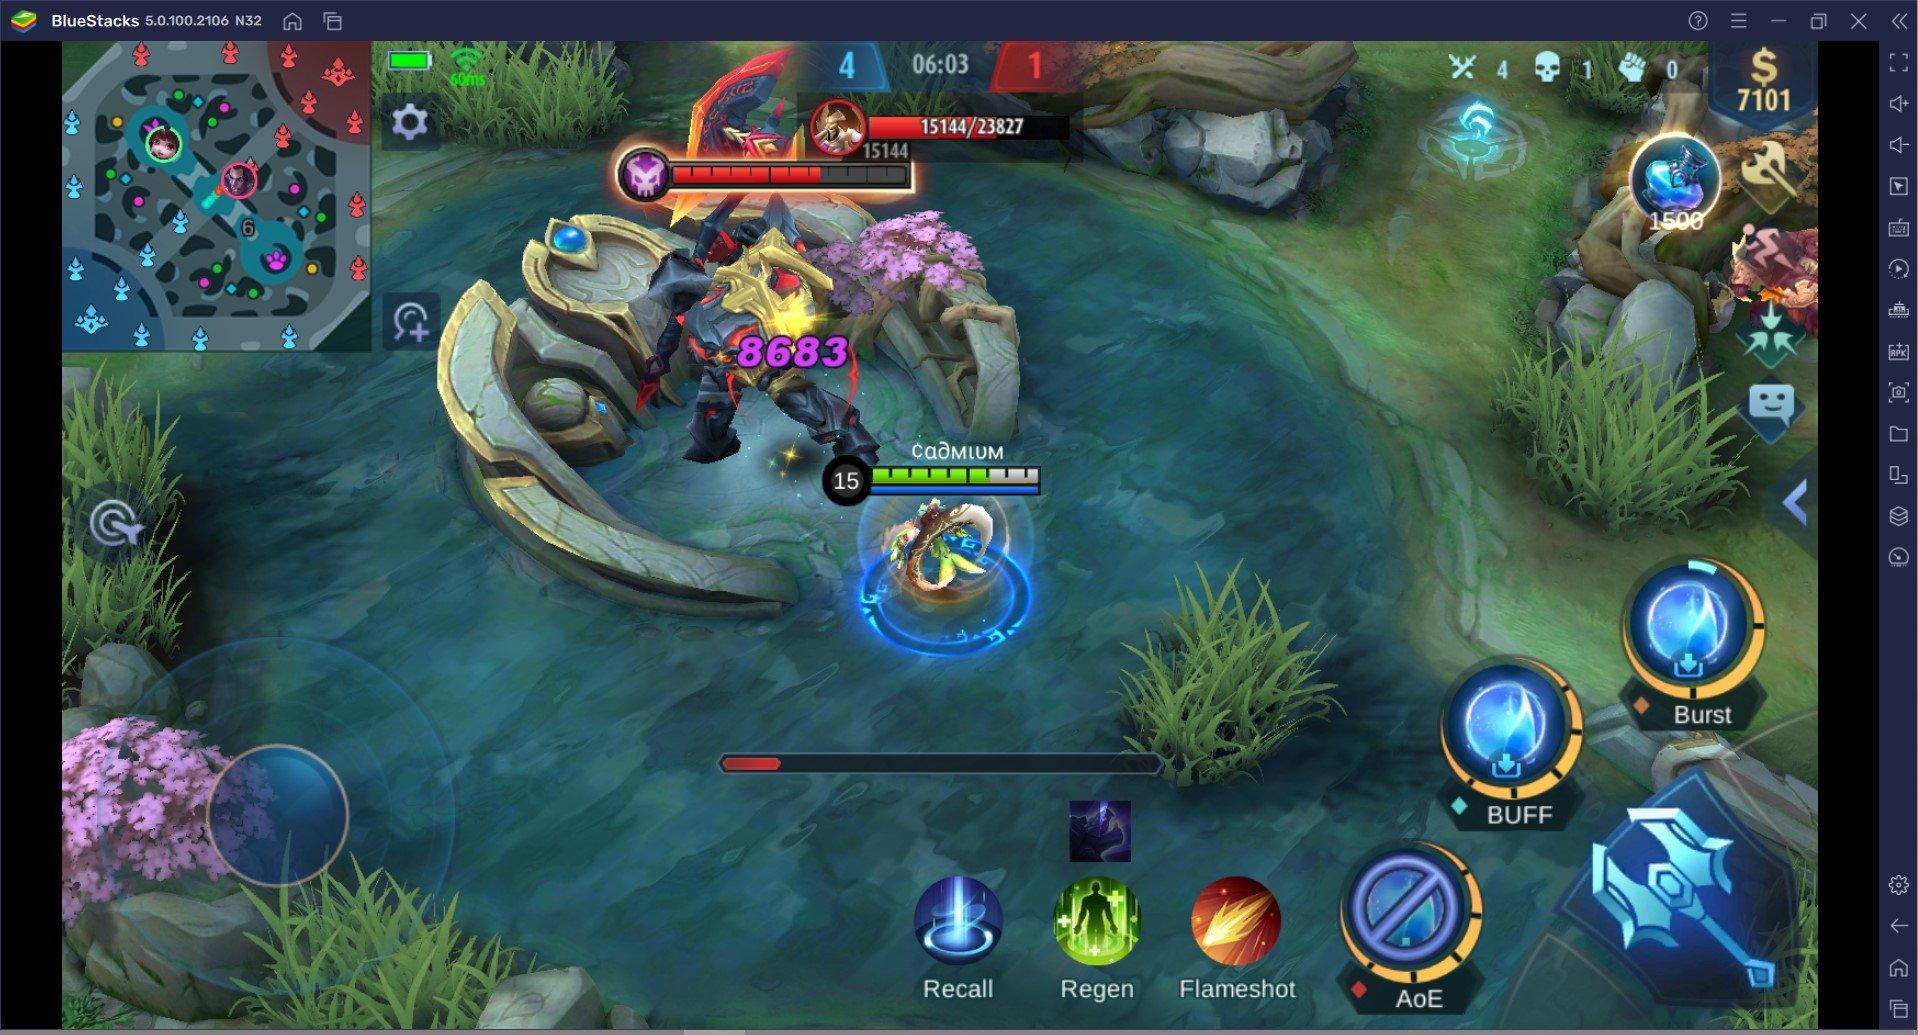 BlueStacks' Mobile Legends: Bang Bang Hero Guide for Chang'e